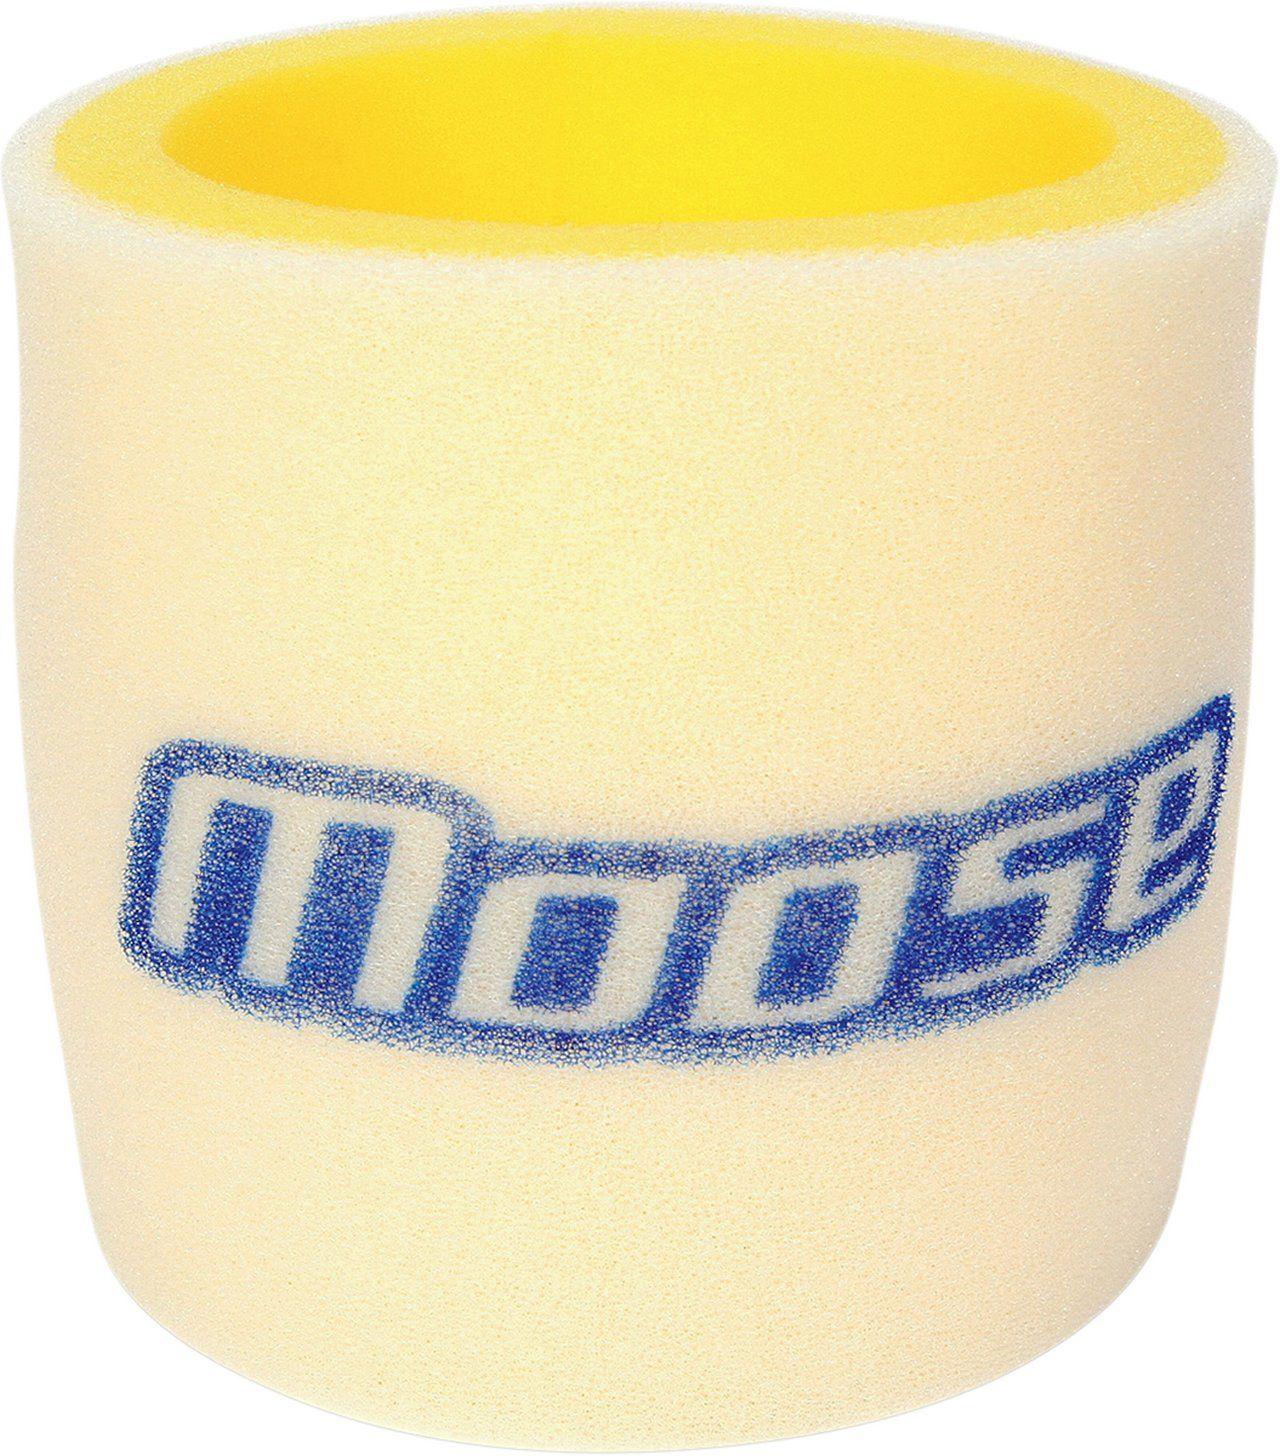 【MOOSE RACING】PPO (PRECISION PRE-OILED) 空氣濾芯 [M763-40-05] - 「Webike-摩托百貨」